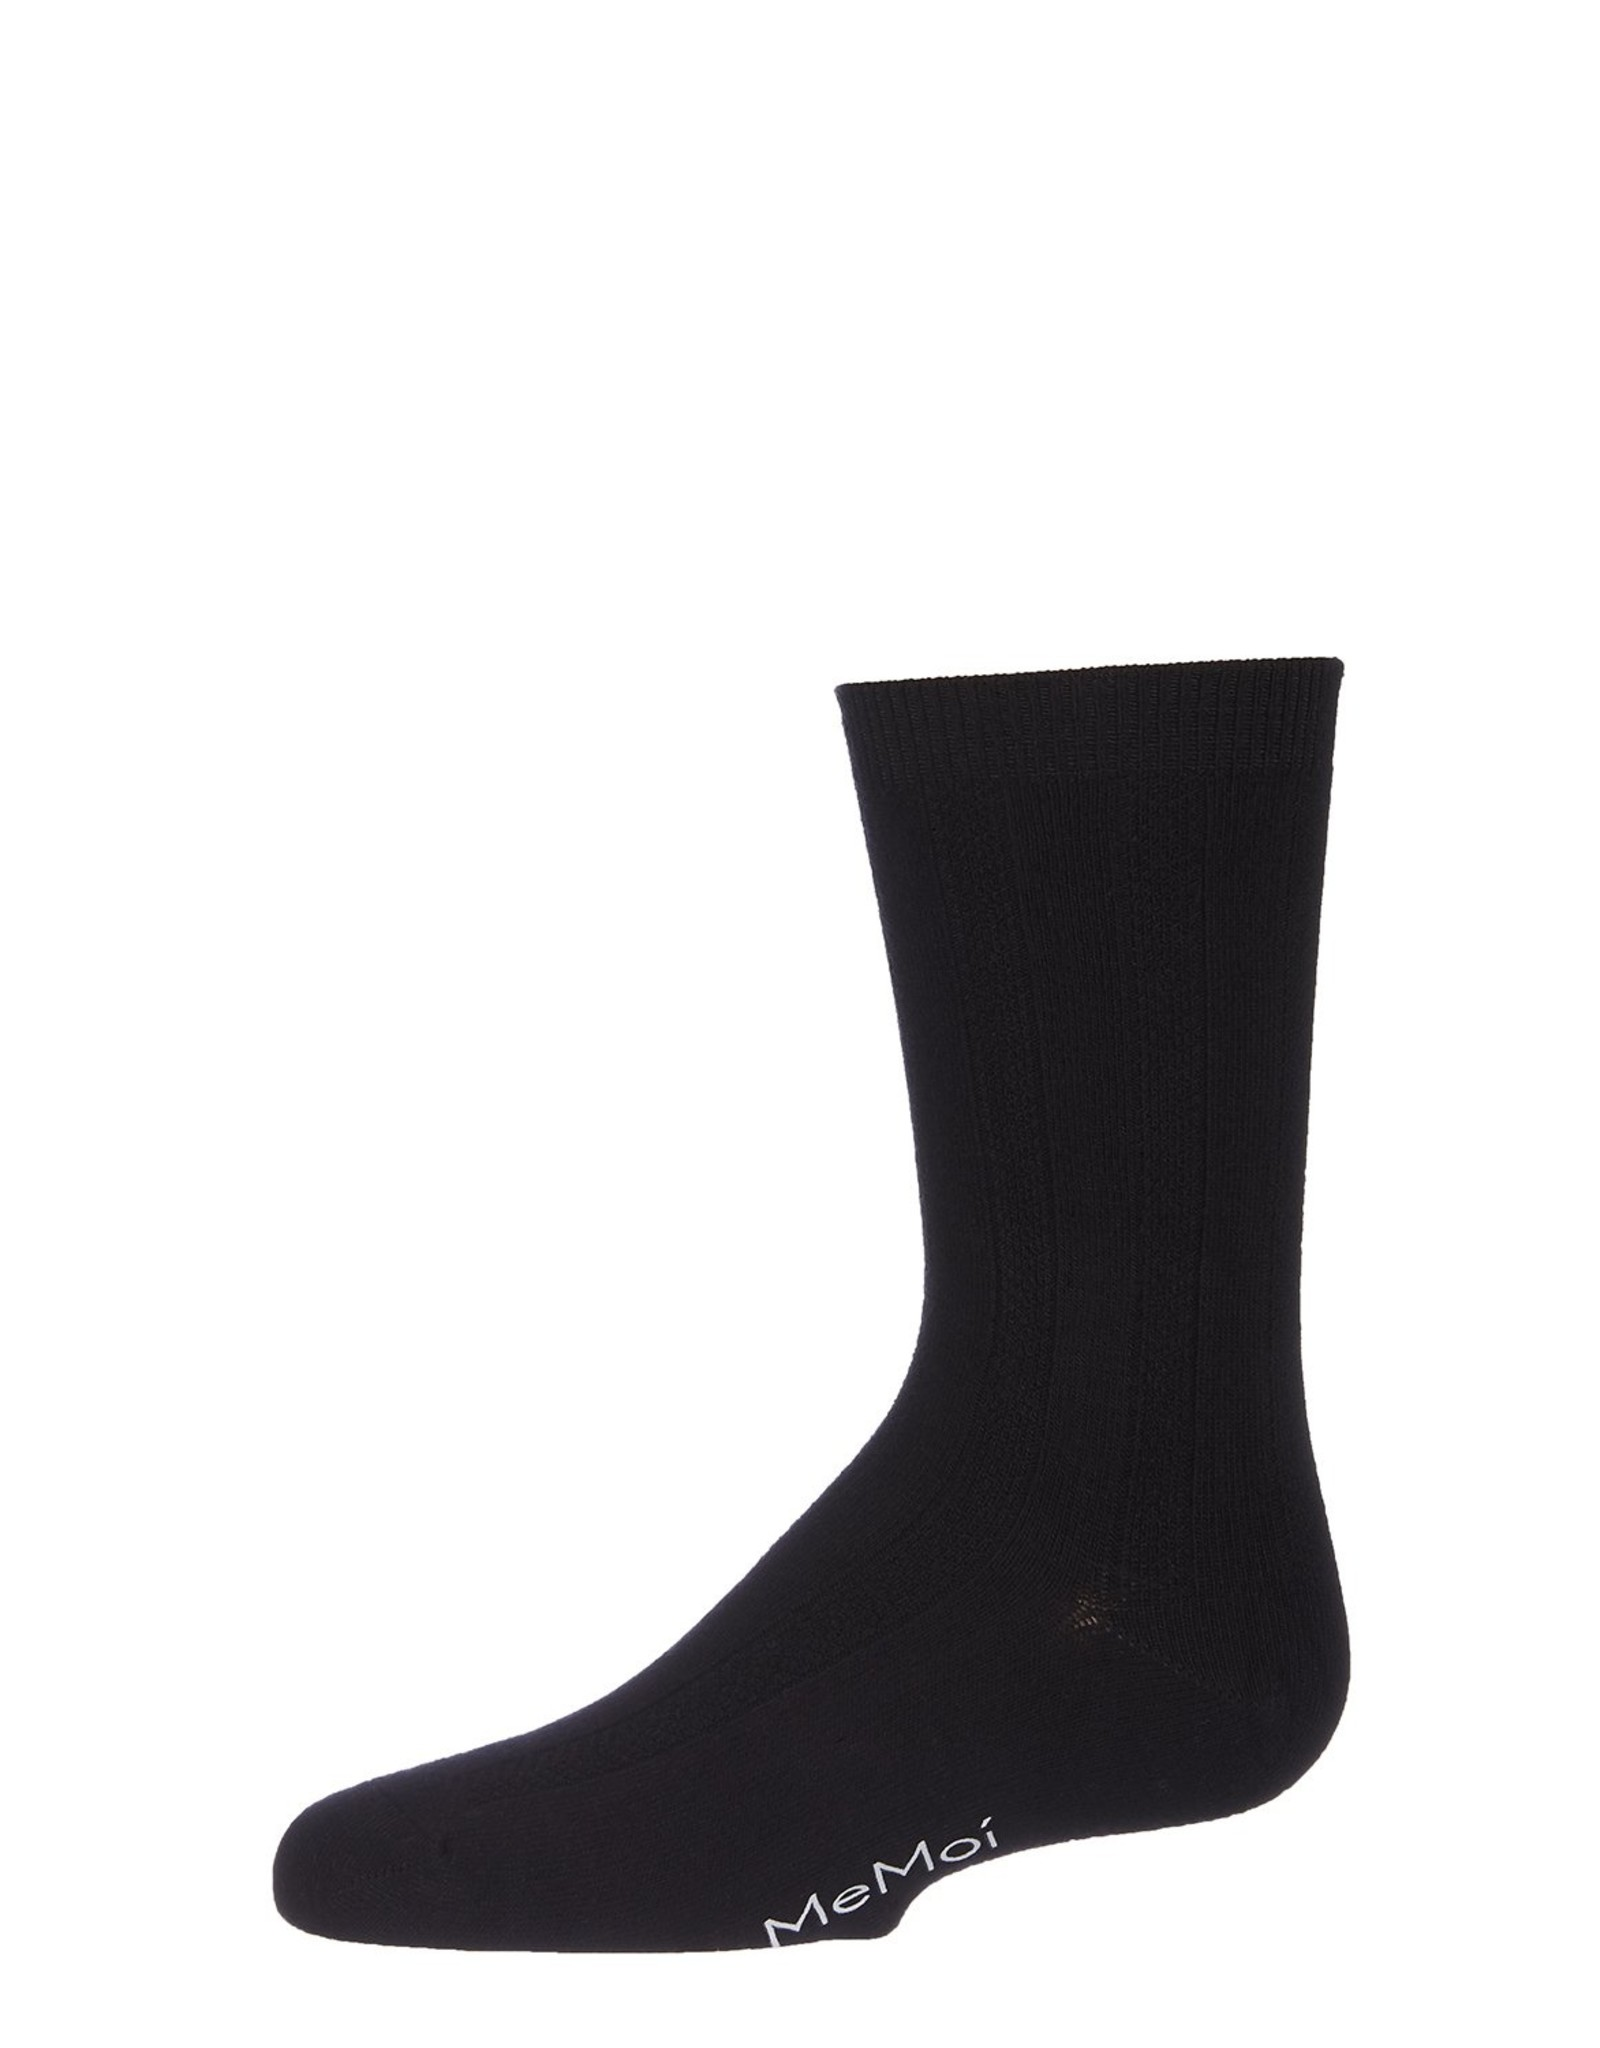 Memoi Memoi Boys Bamboo Woven Ribbed Sock